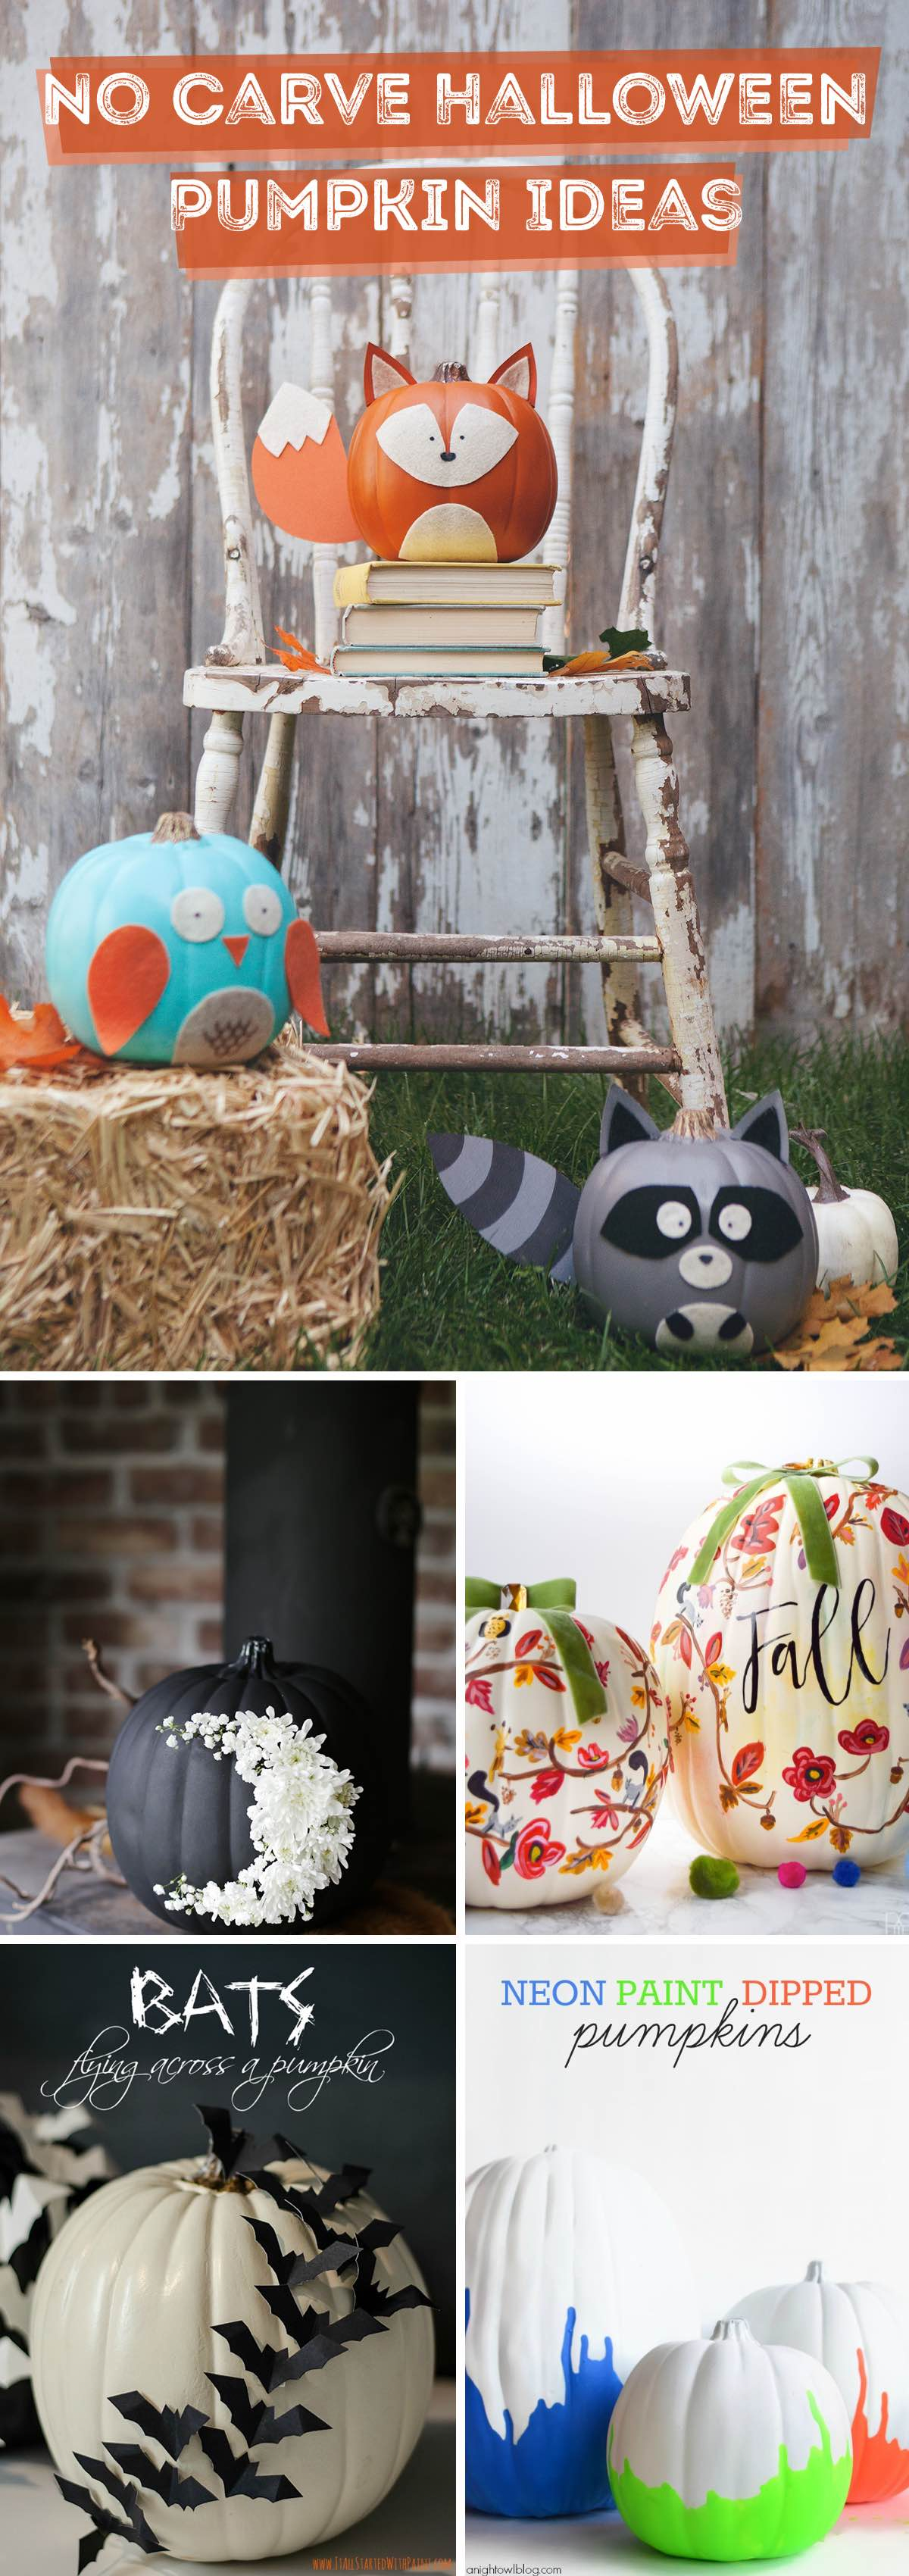 No Carve Halloween Pumpkin Ideas